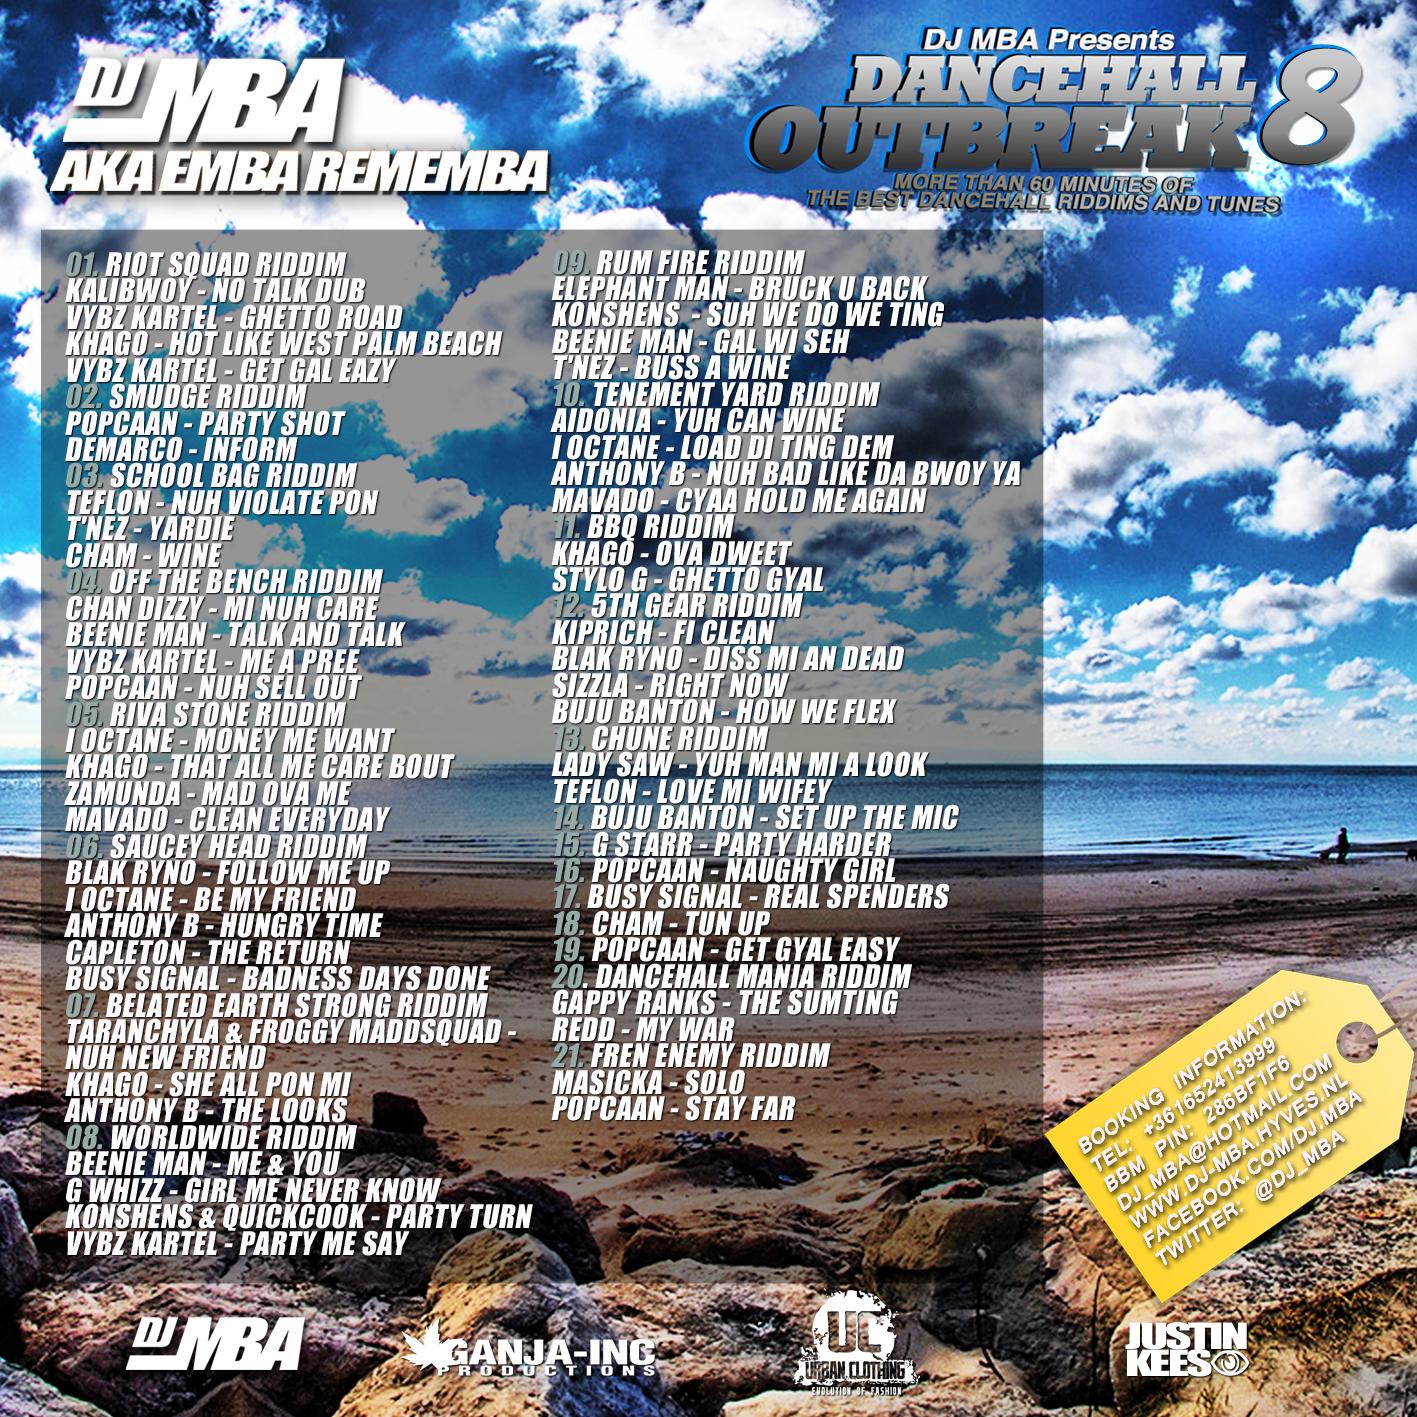 http://2.bp.blogspot.com/-66h_PzXLHy8/T1UrngqnPEI/AAAAAAAASCc/oen4F-R1V0w/s1600/DJ-MBA-Dancehall-Outbreak-8-BACK.jpg